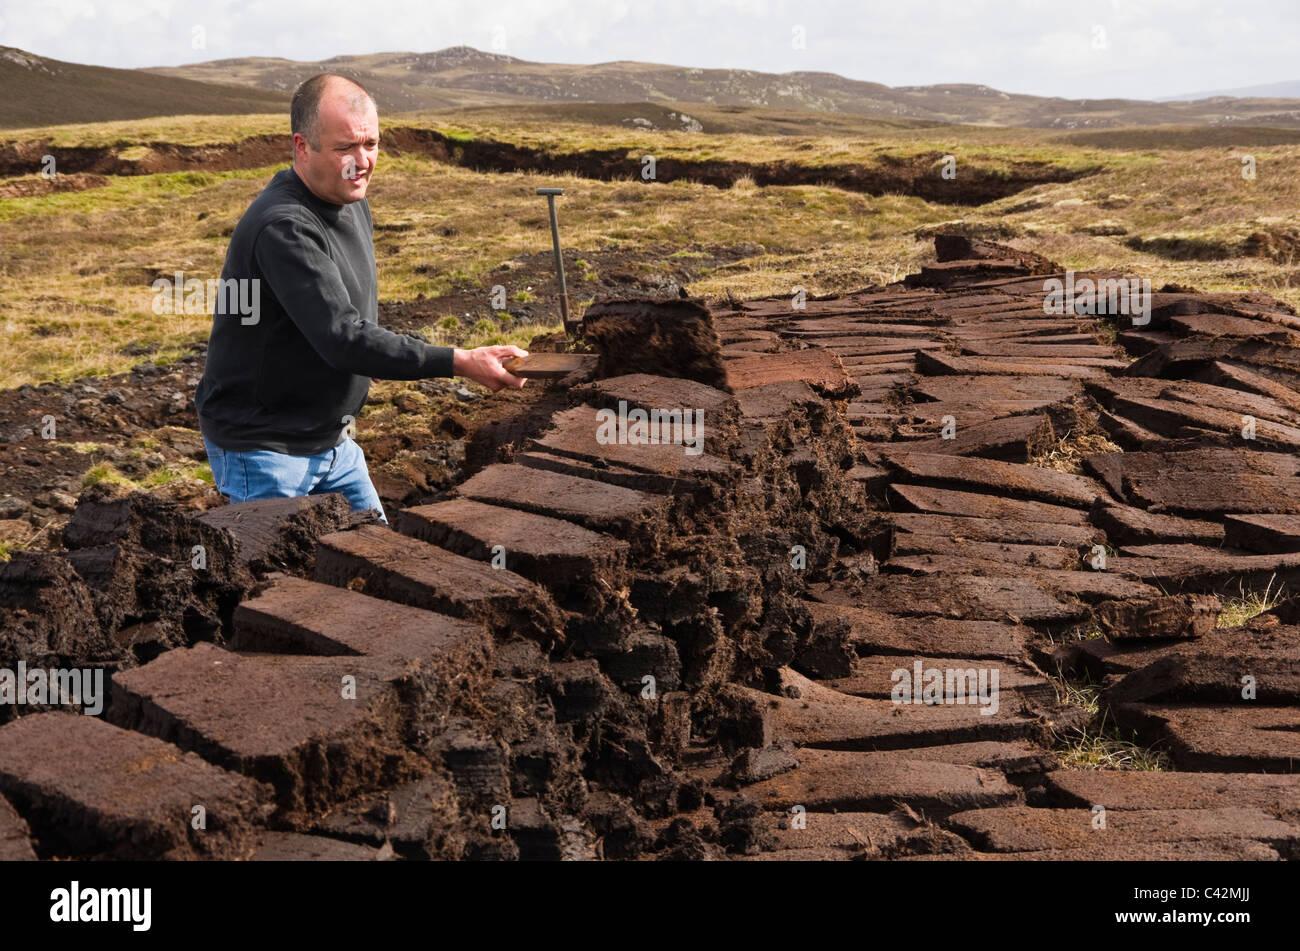 Shetland Islands, Scotland, UK, Europe. Man cutting peat blocks for traditional fuel - Stock Image